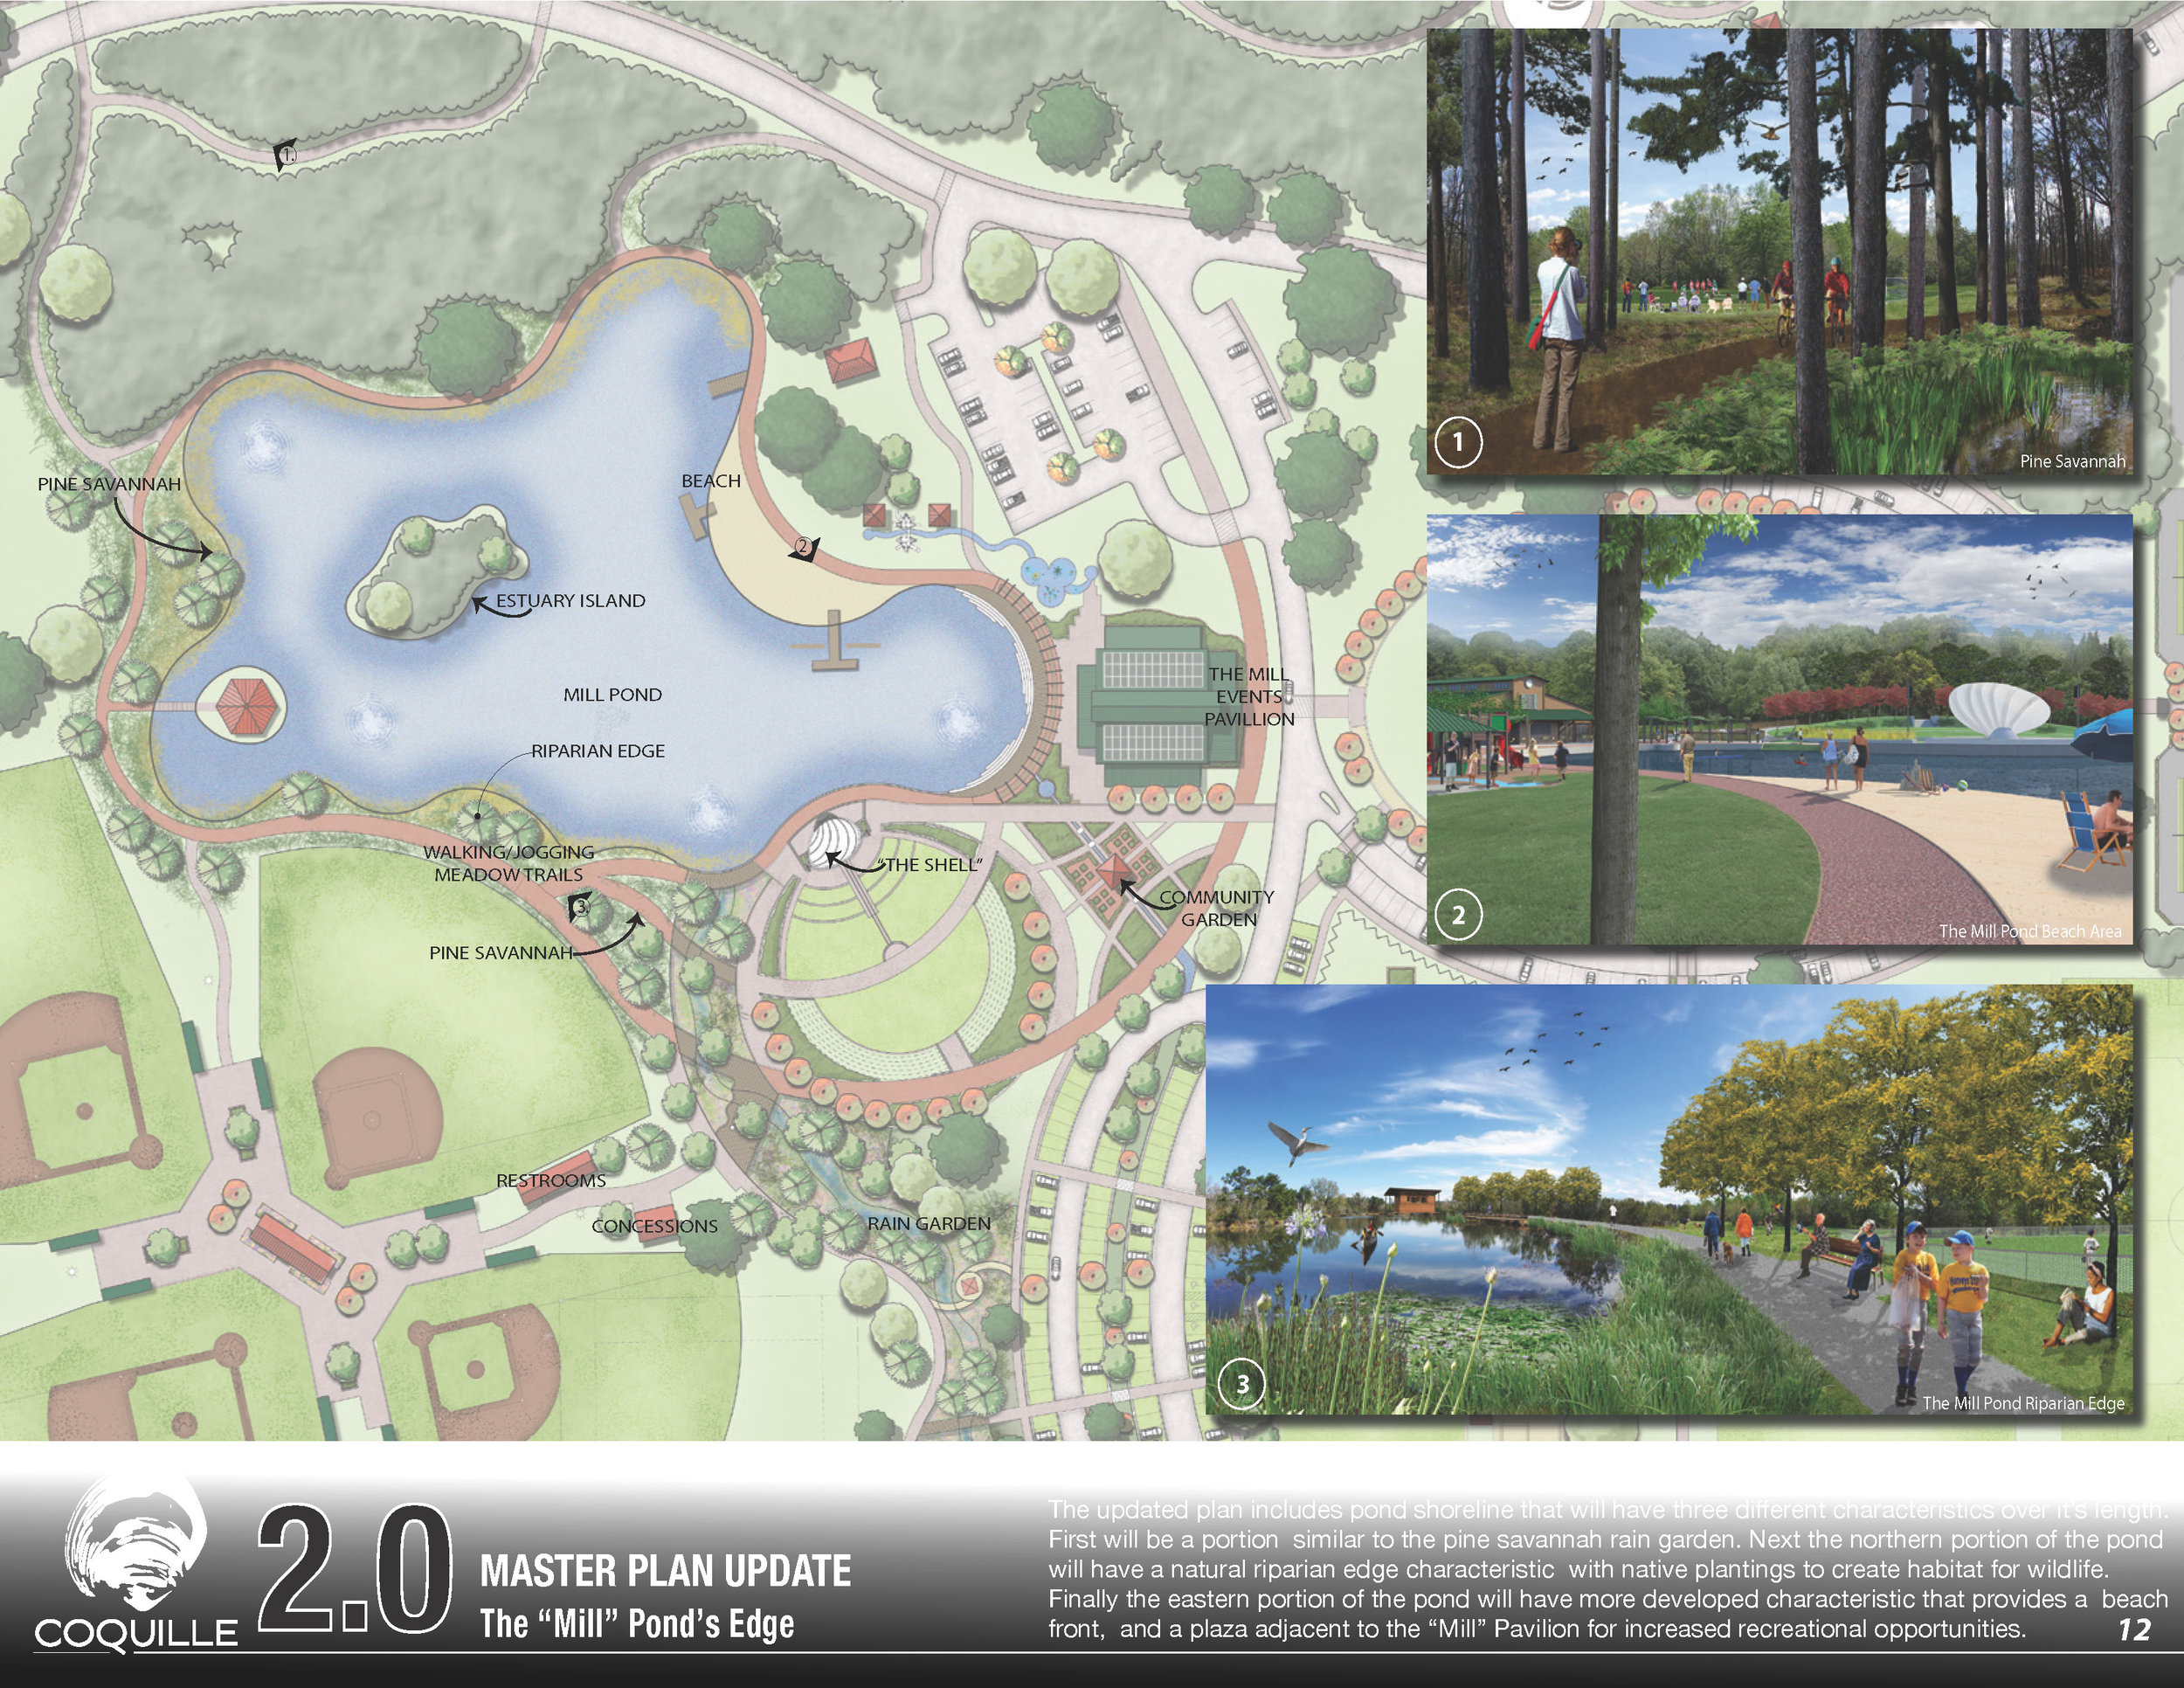 Joseph Furr Design Studio - Coquille Master Plan_Page_10.jpg